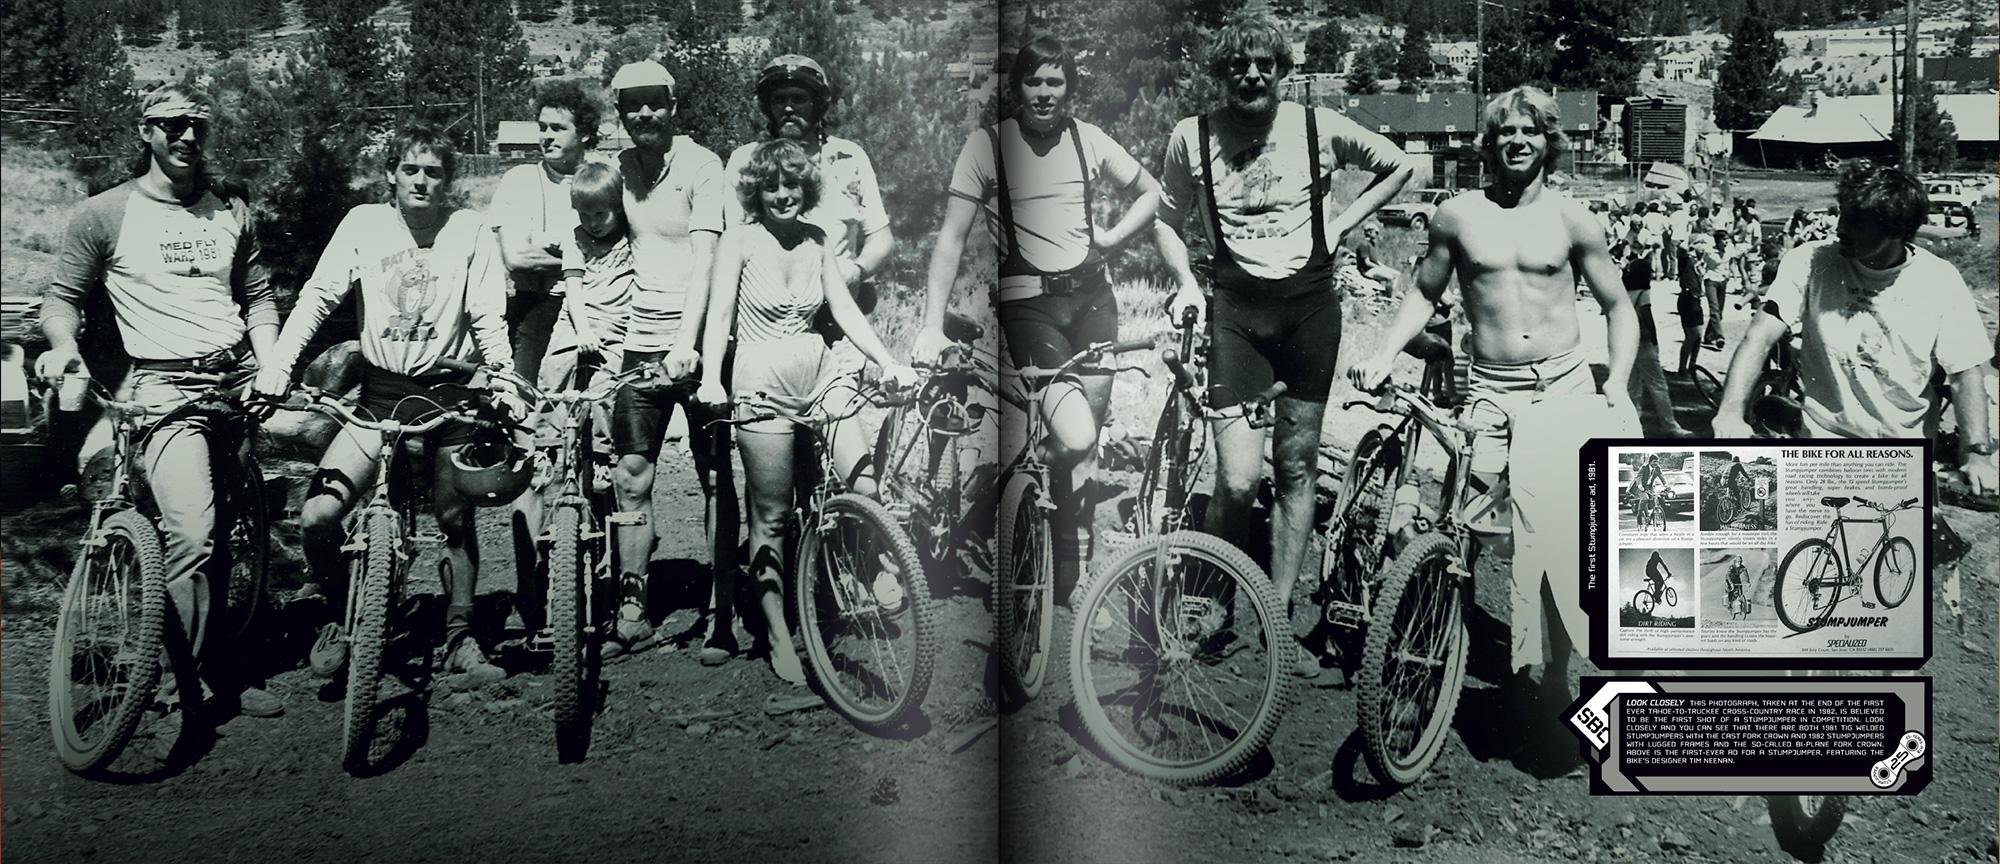 Stunt jumper anniversary book depicting bike cogs and stuntjumper bike